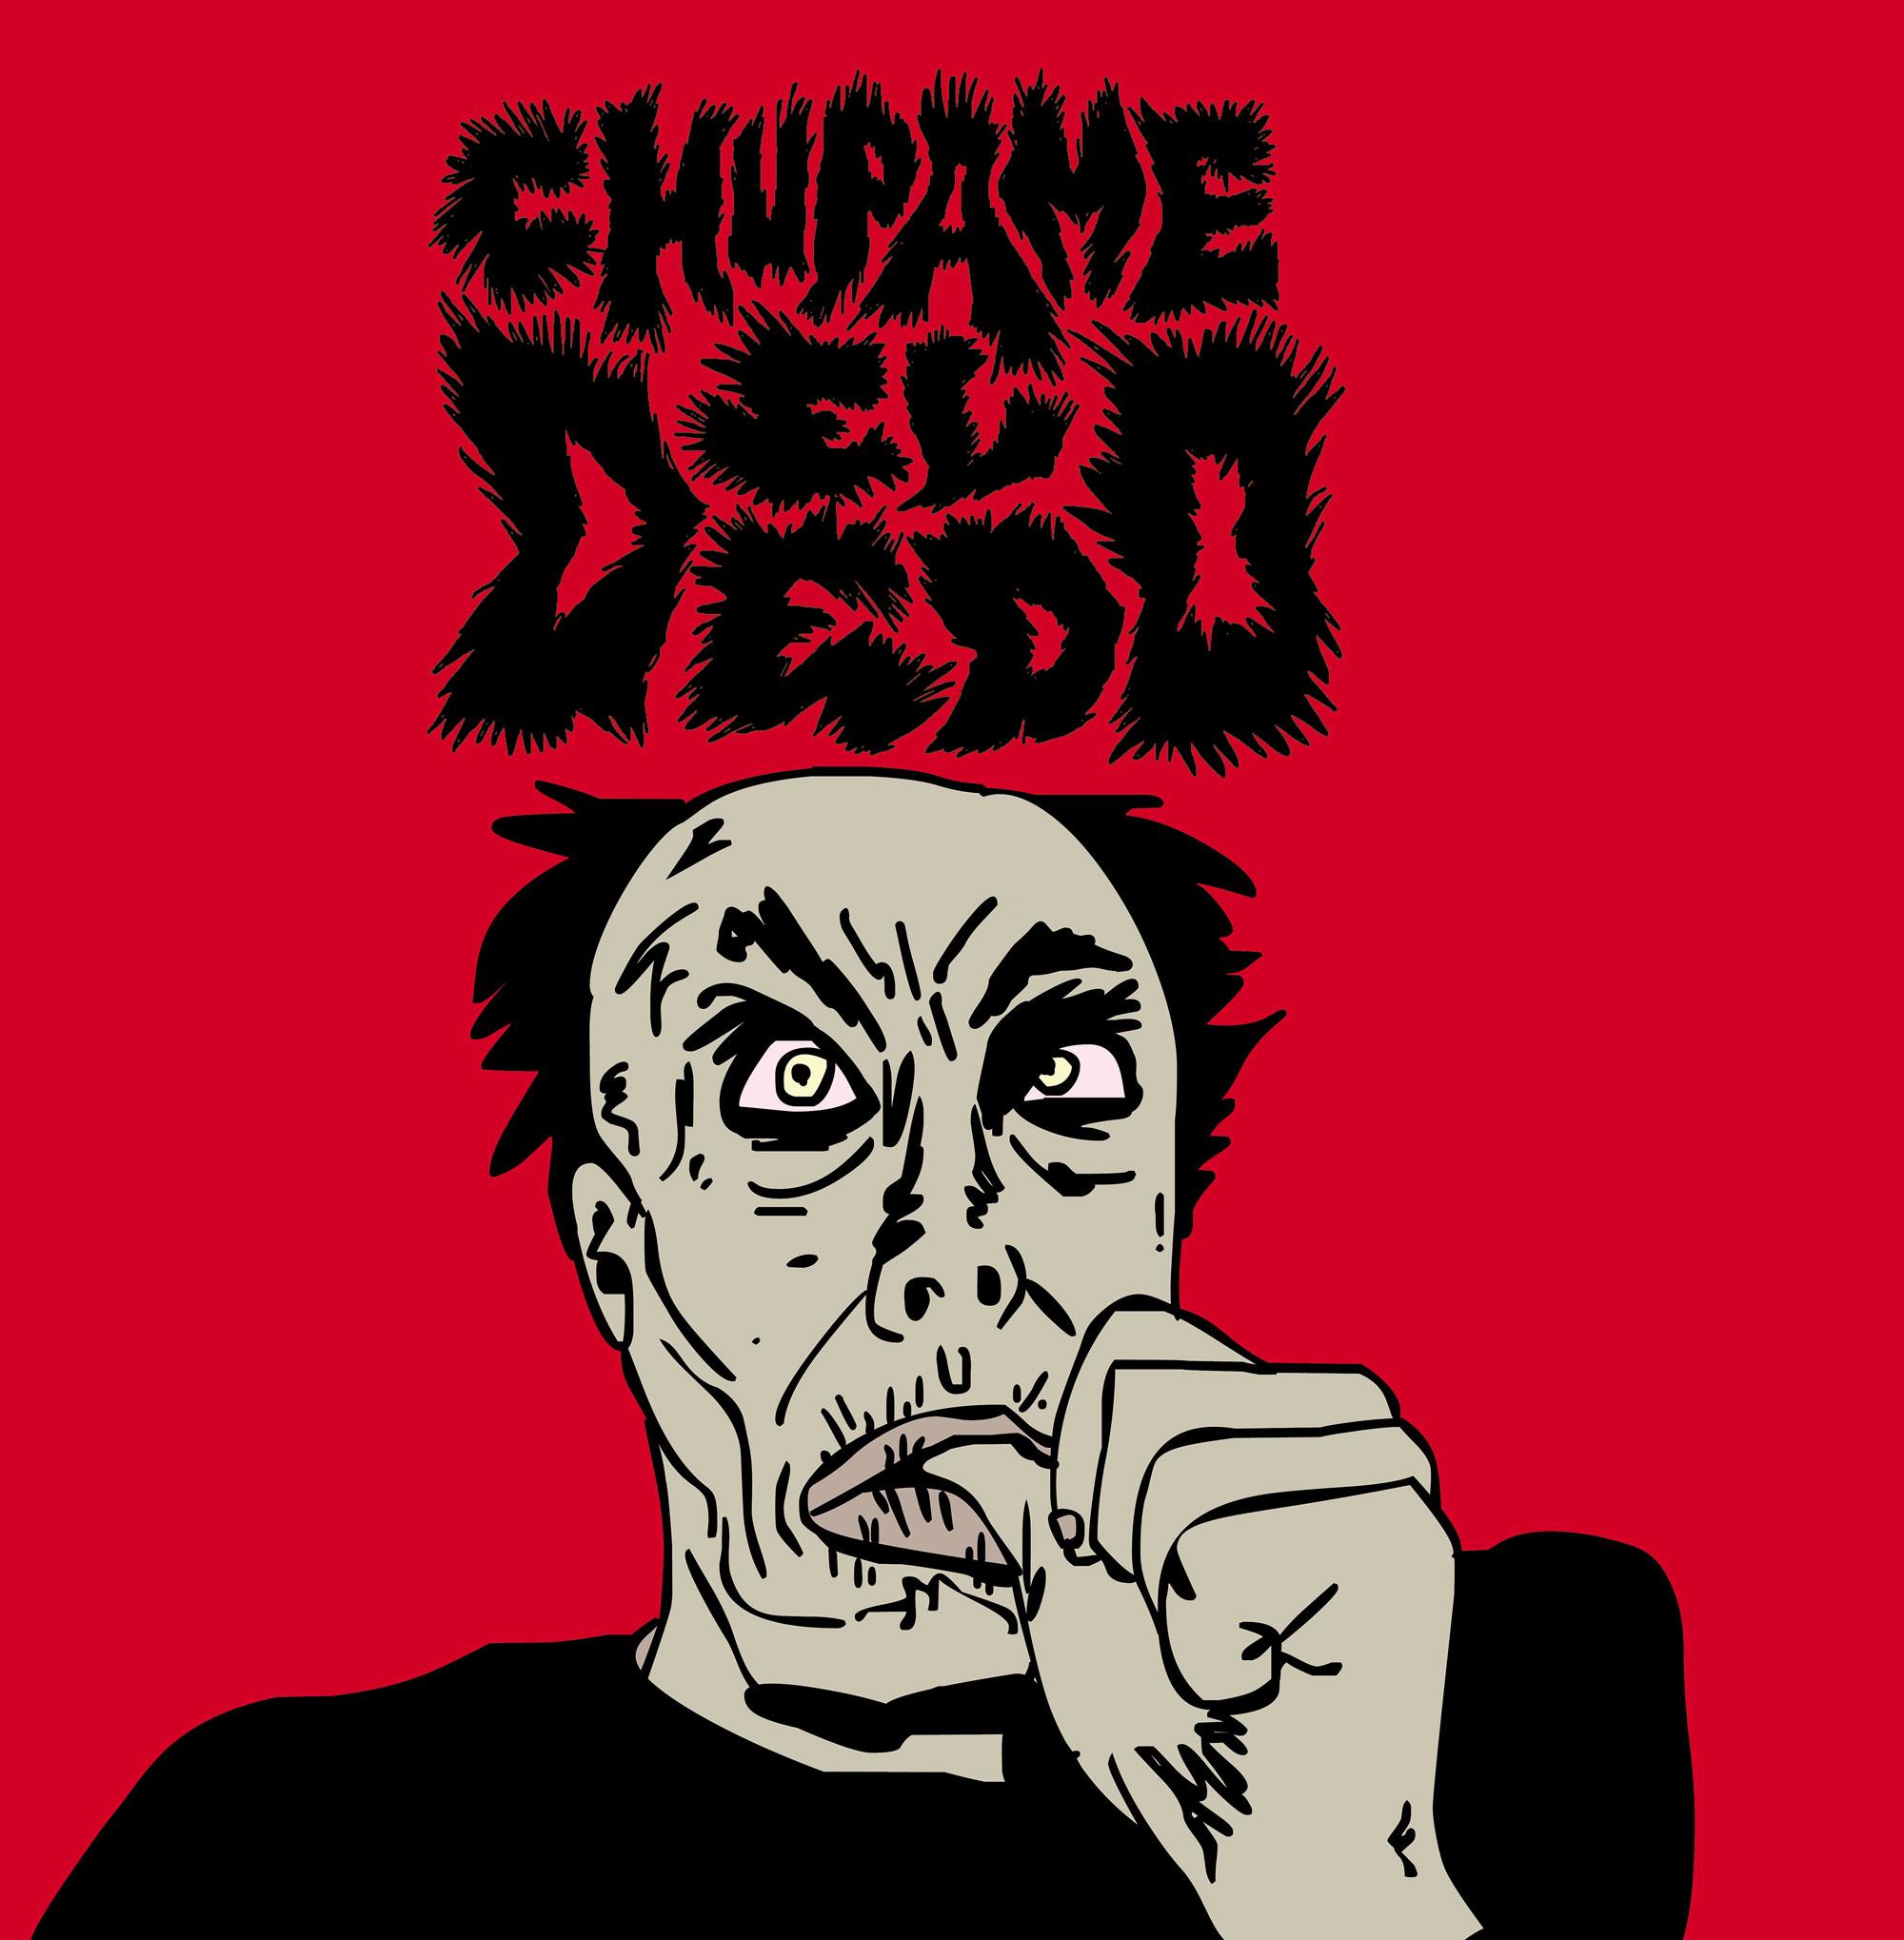 Chupame El Dedo / Chupame El Dedoのジャケット